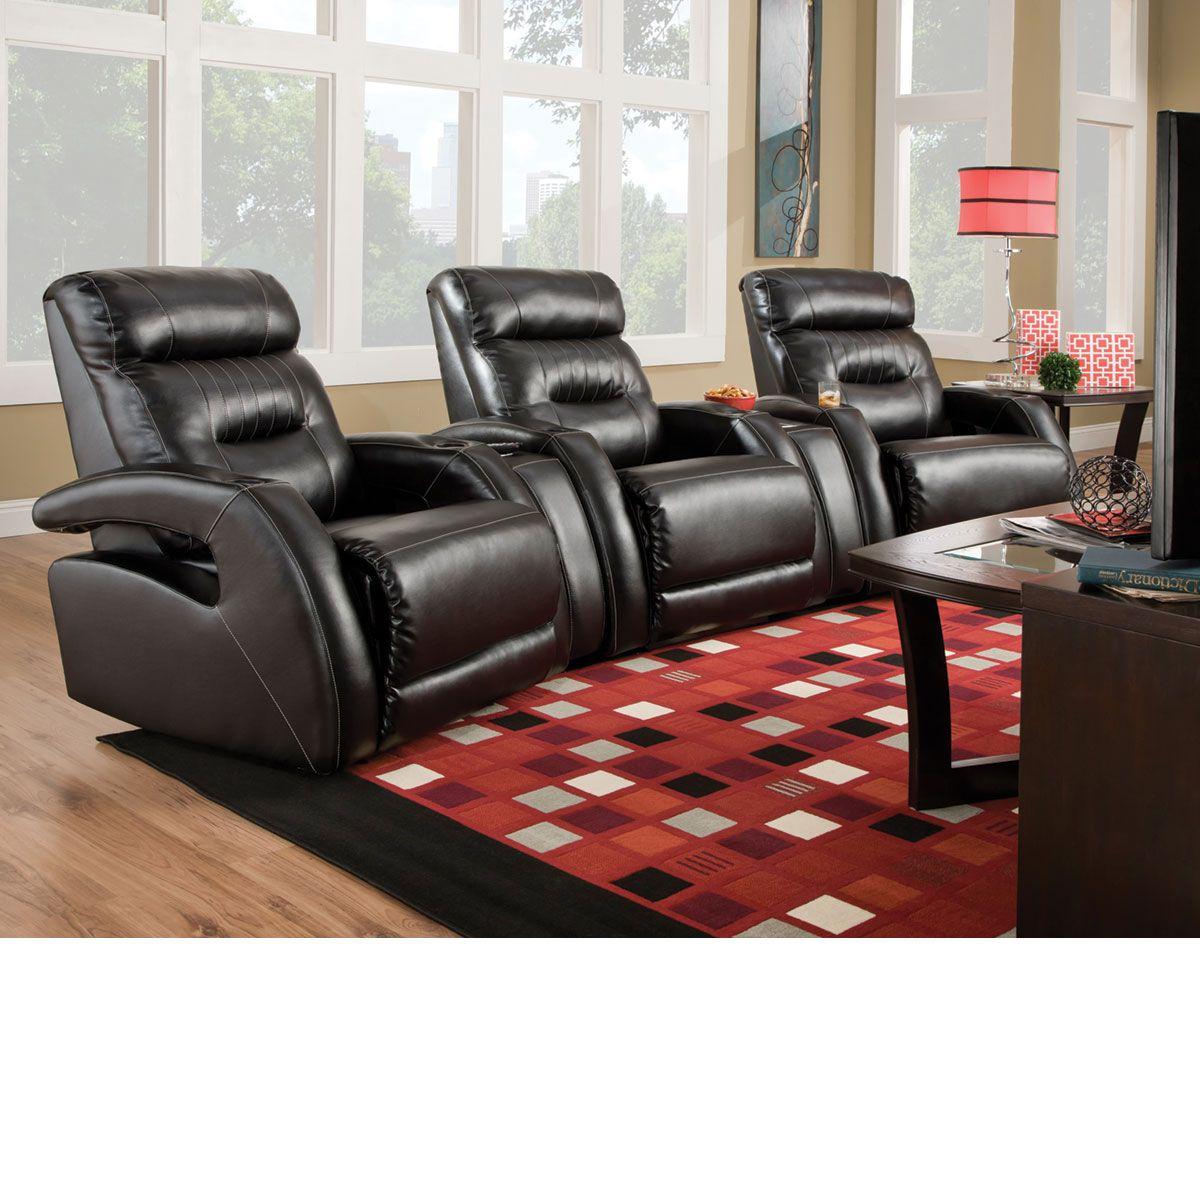 The Dump Furniture - POWER RECLINER HOME THEATER | furniture ...